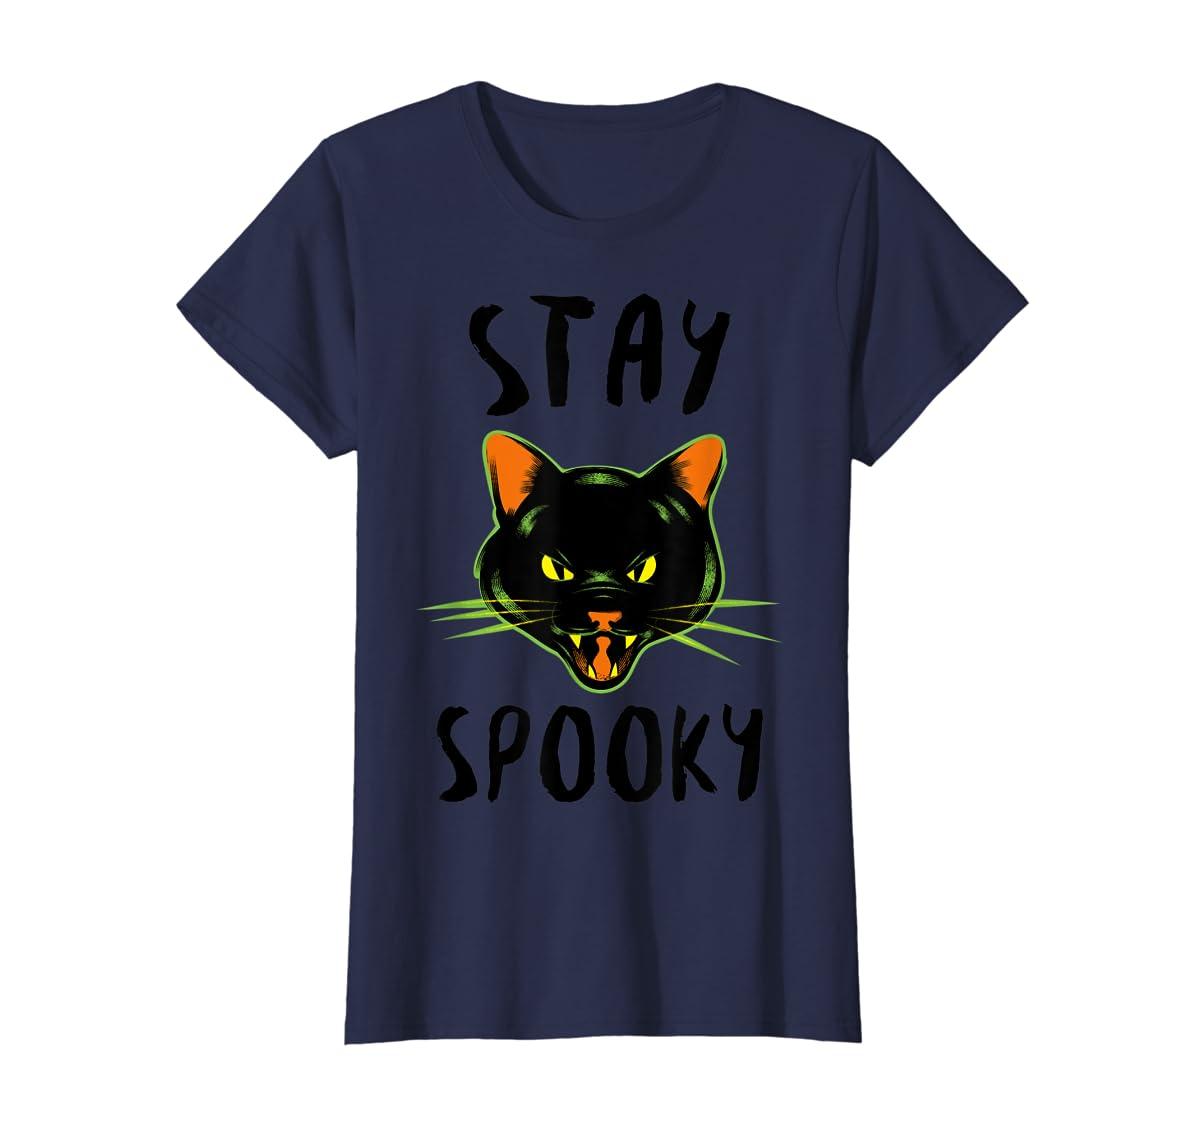 Stay Spooky | Scary Halloween Black Cat T-Shirt-Women's T-Shirt-Navy